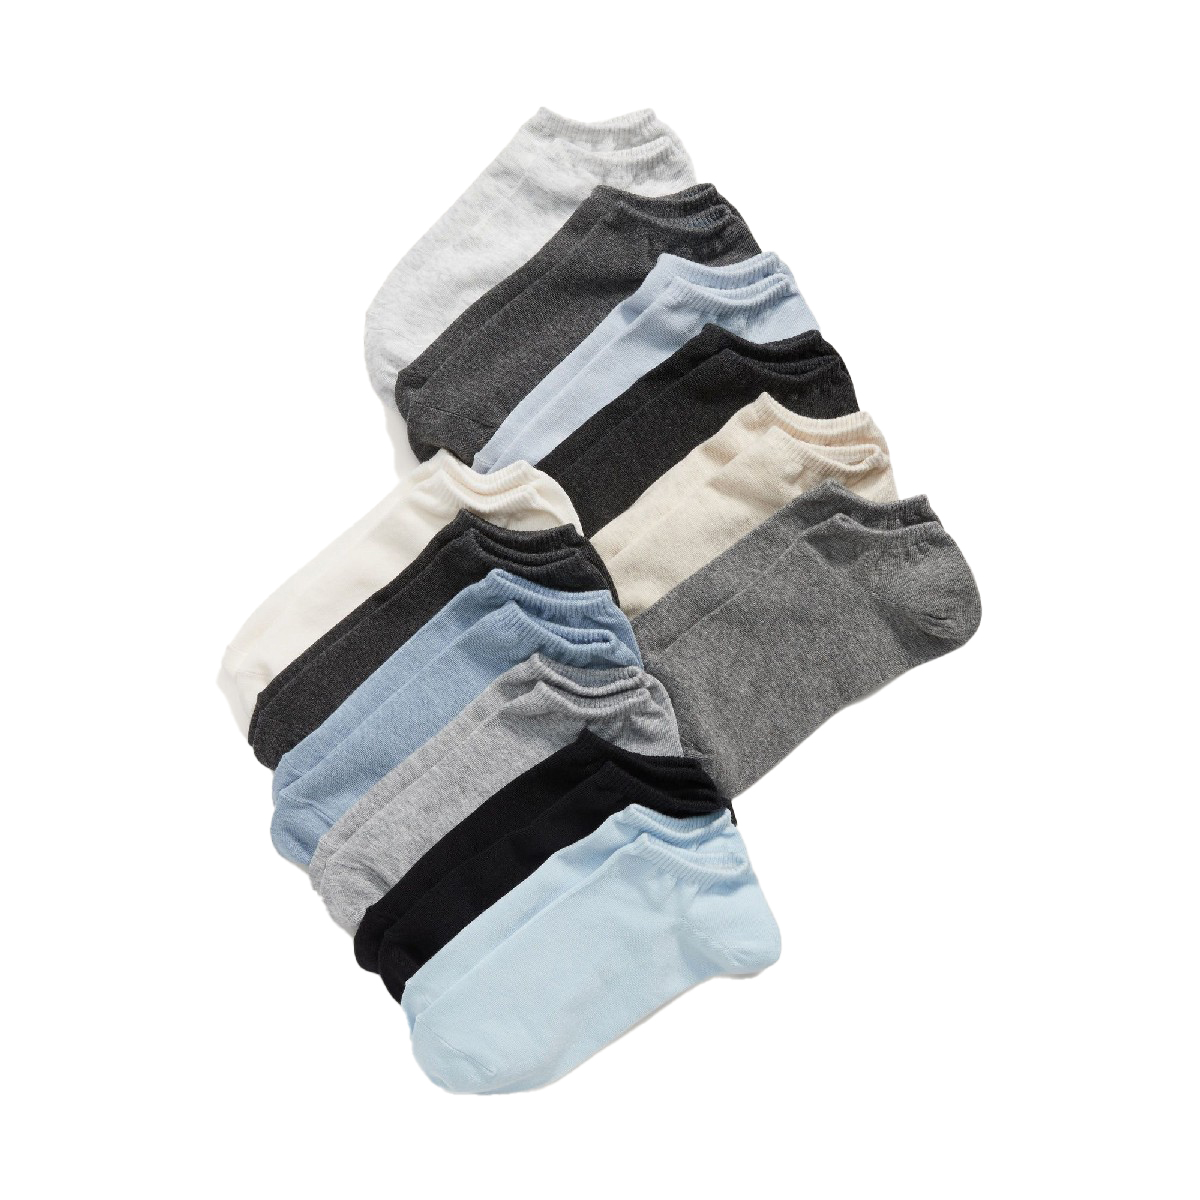 Code 9 Pairs Cotton Ankle Socks For Men Women - 3 Random colors